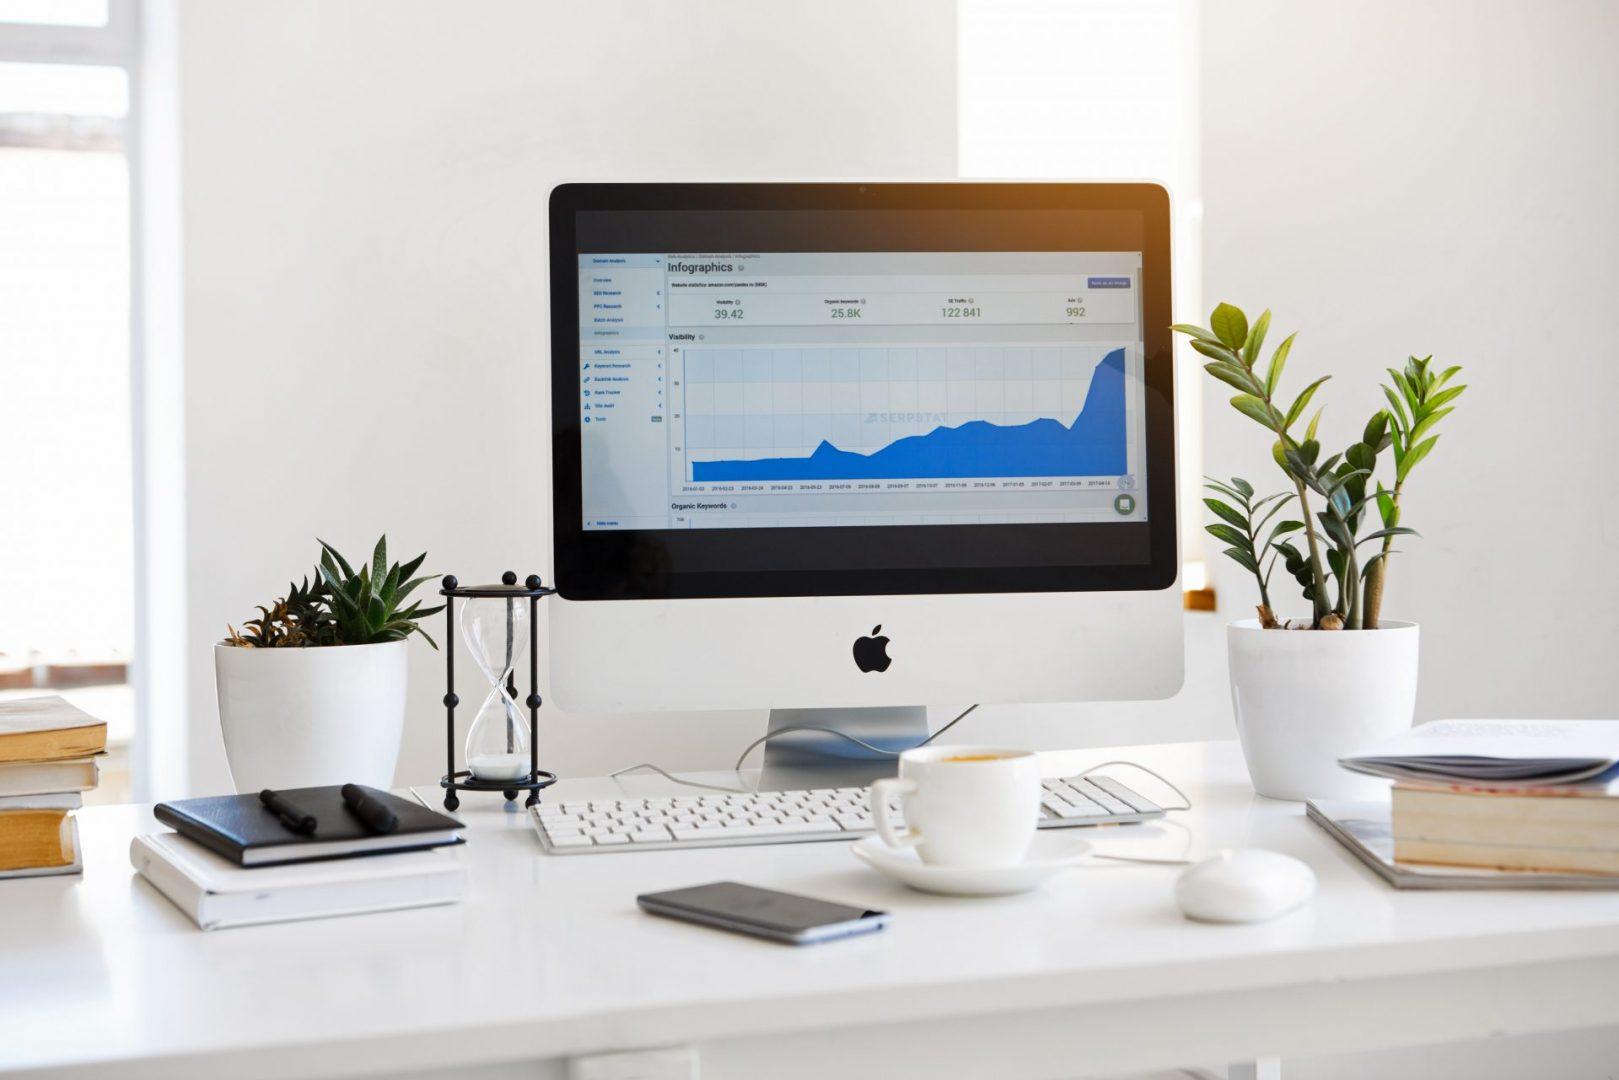 Biurko, na którym stoi monitor marki APPLE